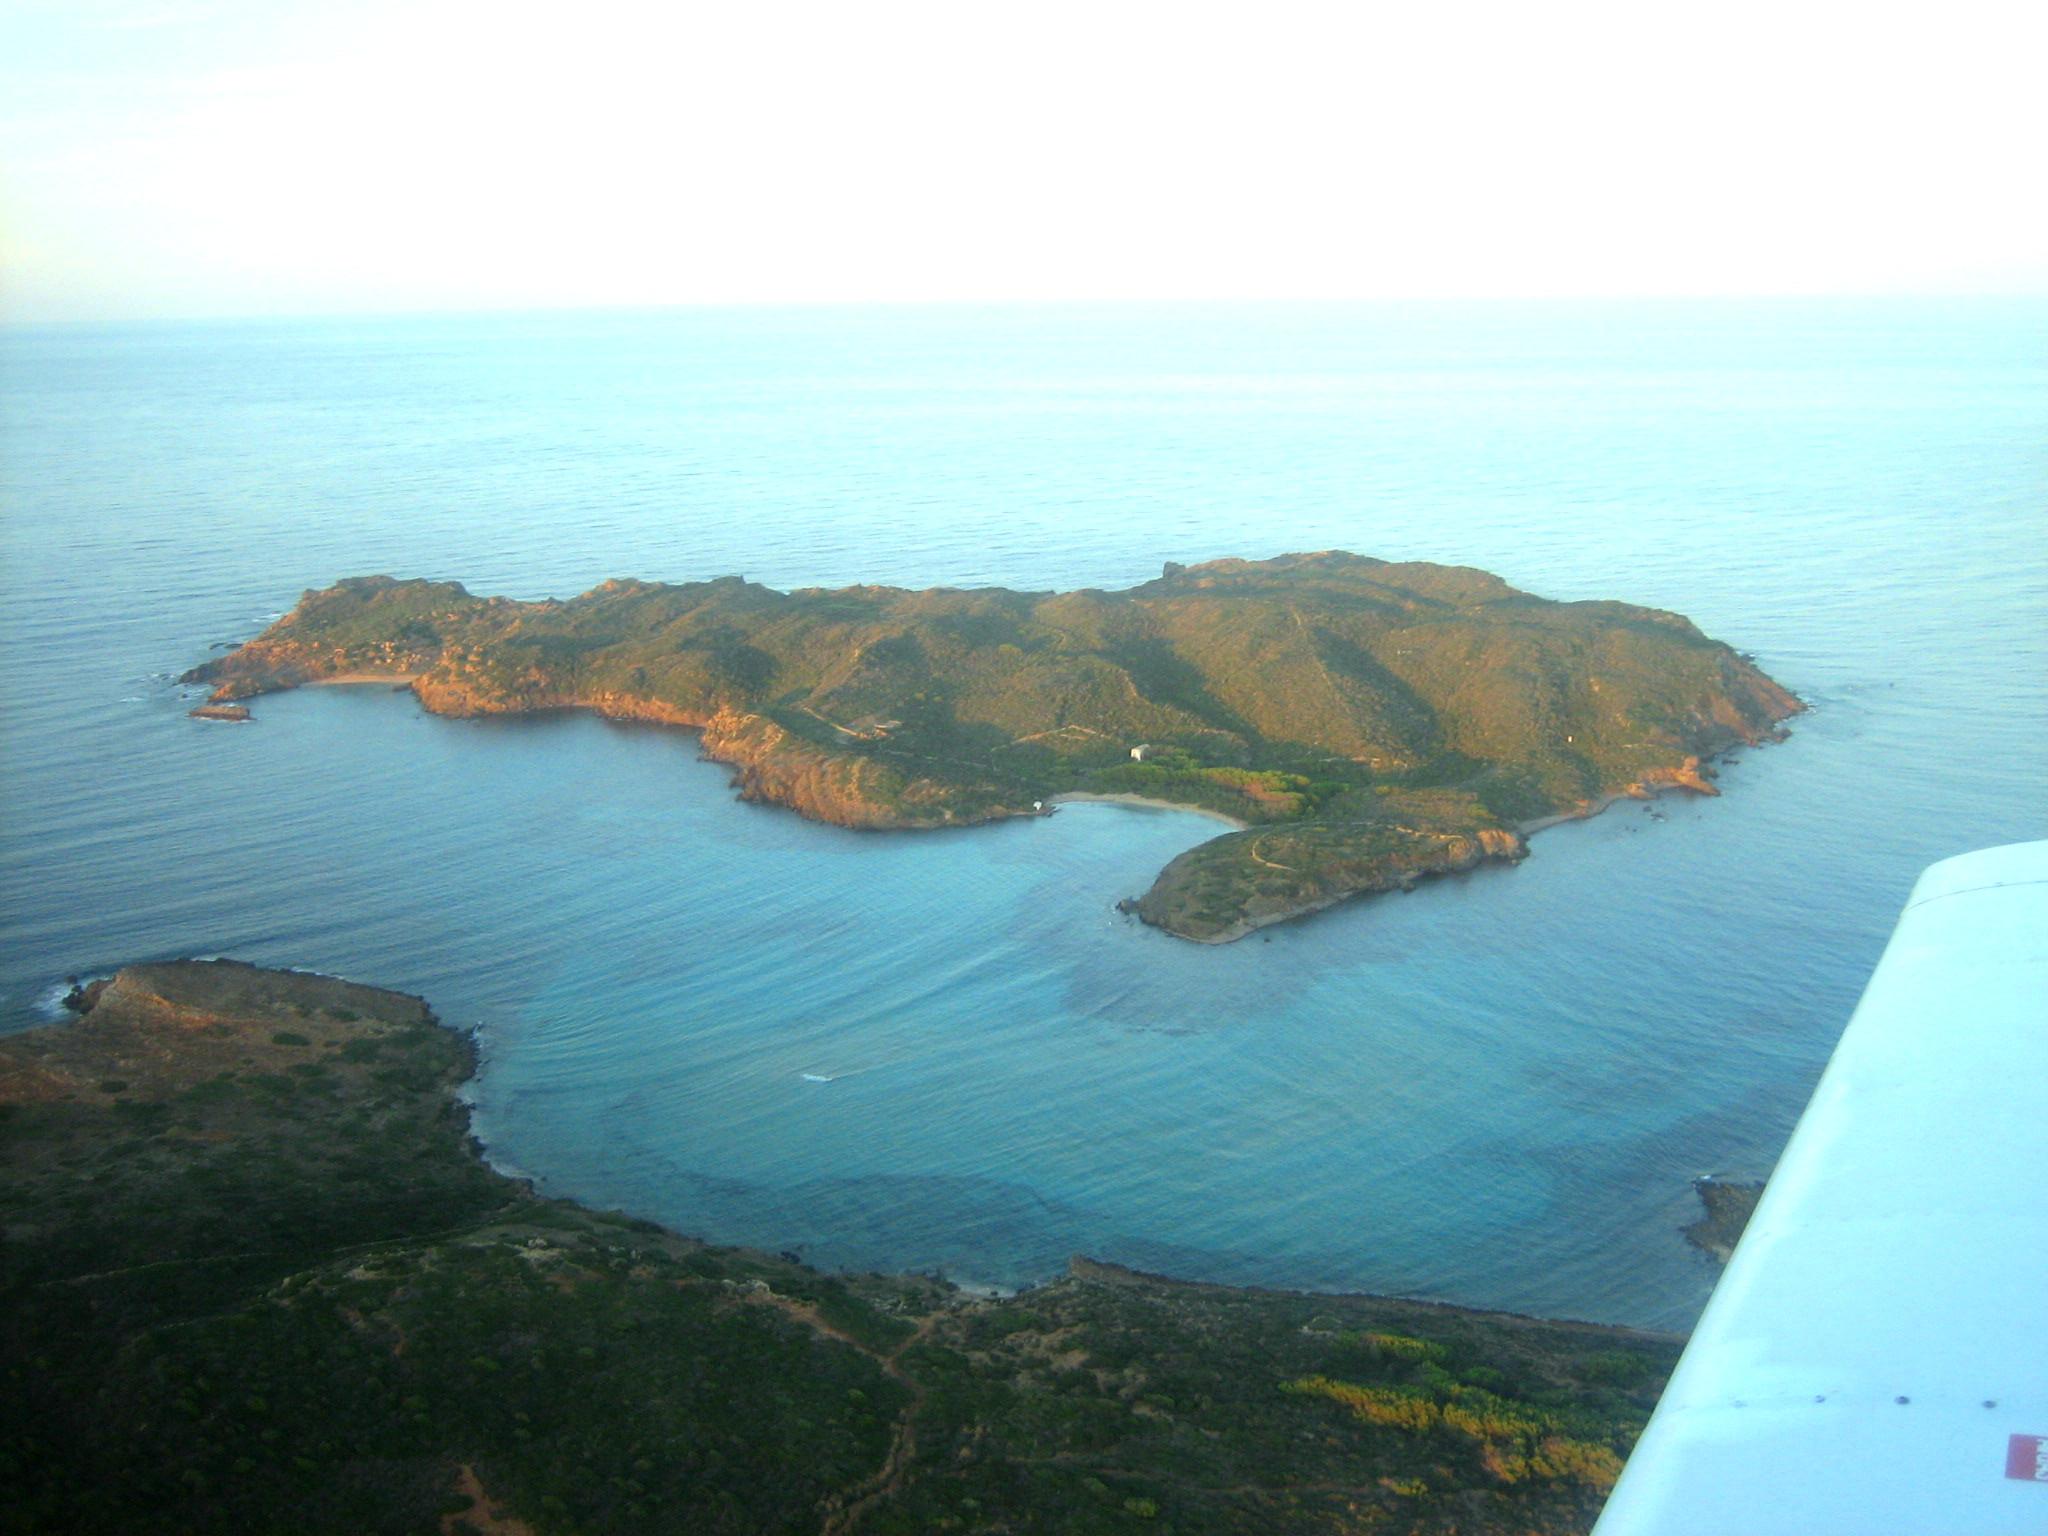 Depiction of Isla de Colom